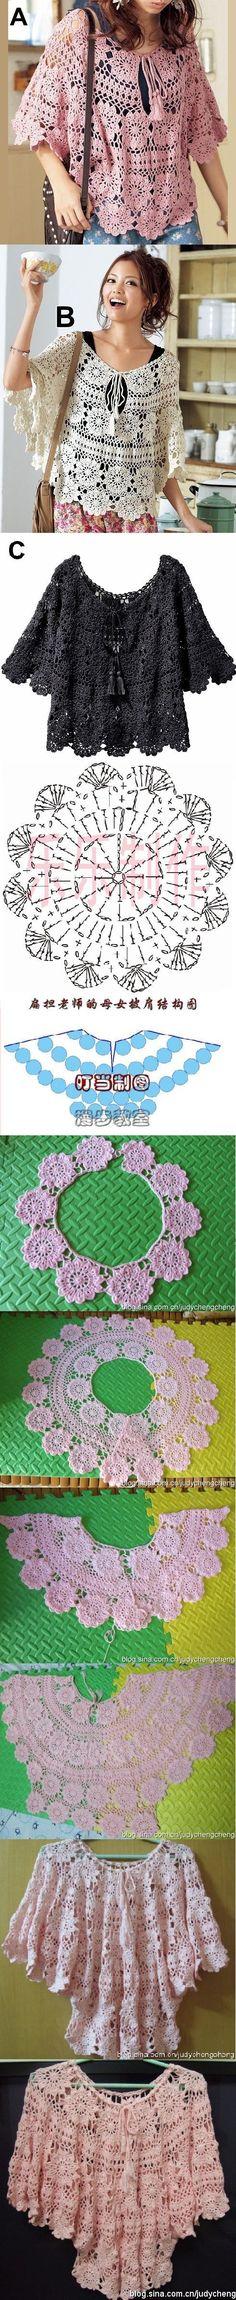 Luty Artes Crochet: Blusas em